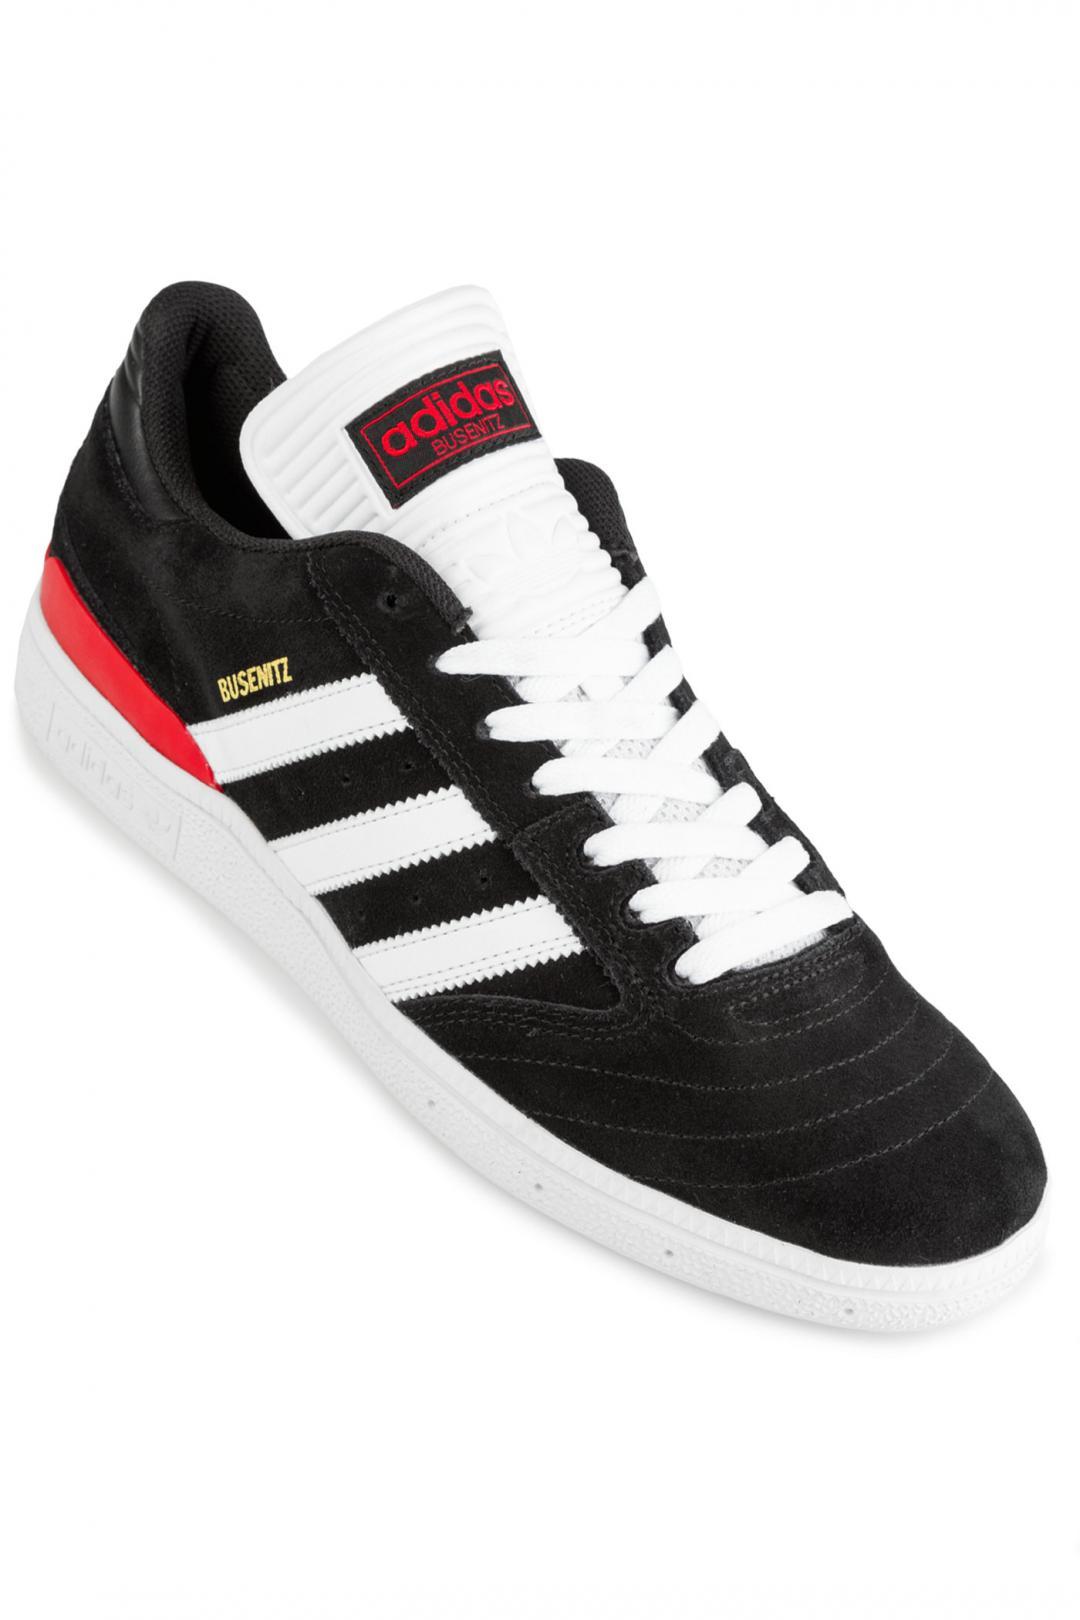 Uomo adidas Skateboarding Busenitz core black white scarlet | Scarpe da skate